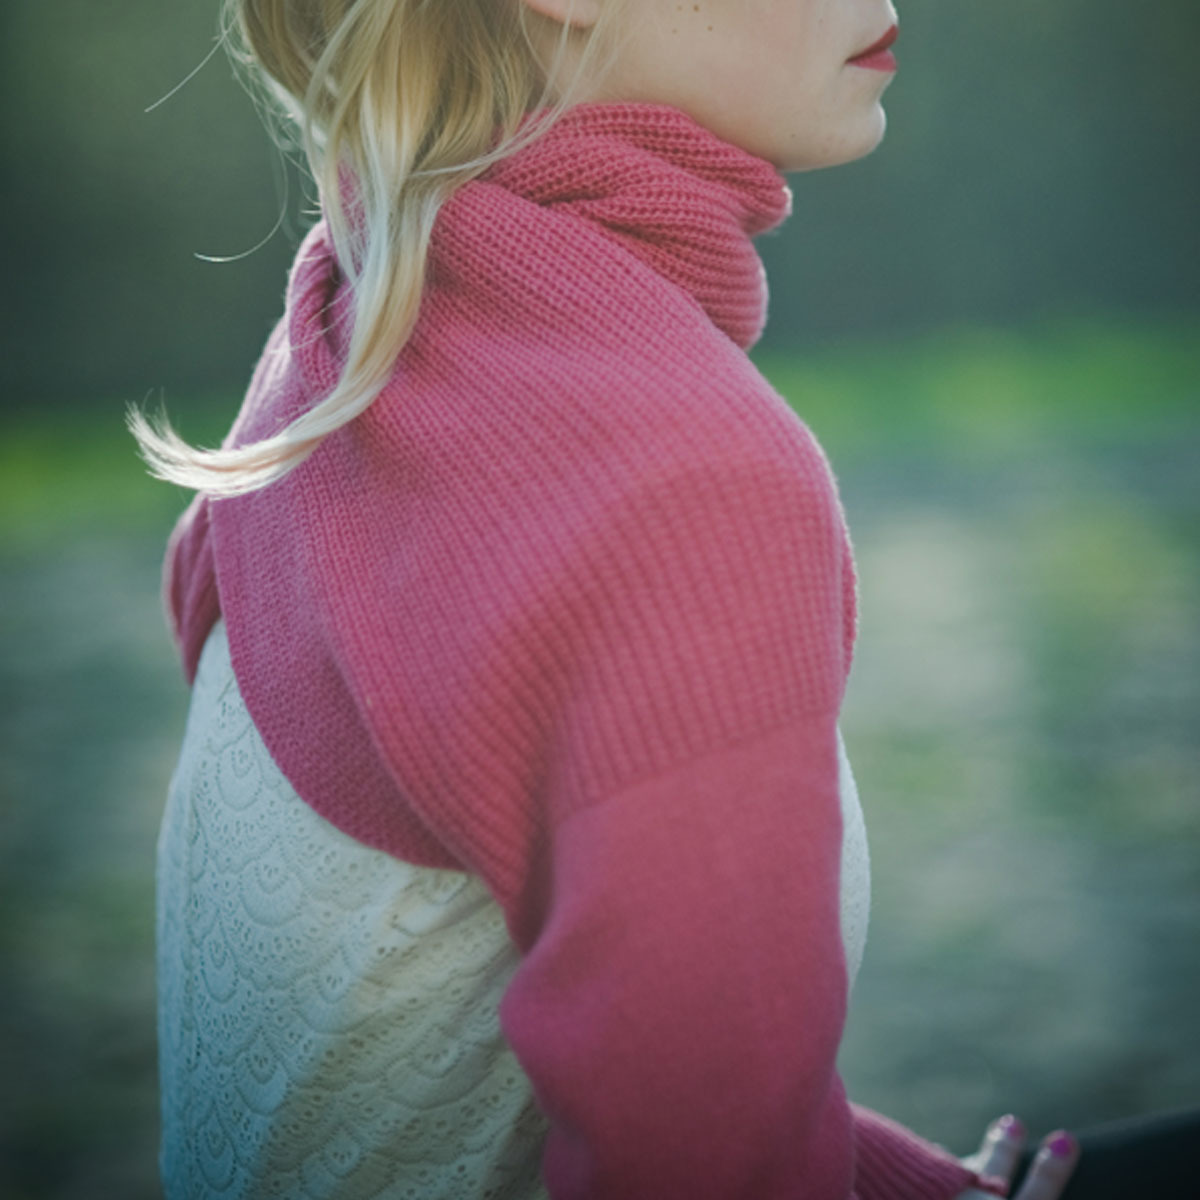 celapiu|Pink  Neverending sleeves  | ピンク - 使い方いろいろな片袖ニット